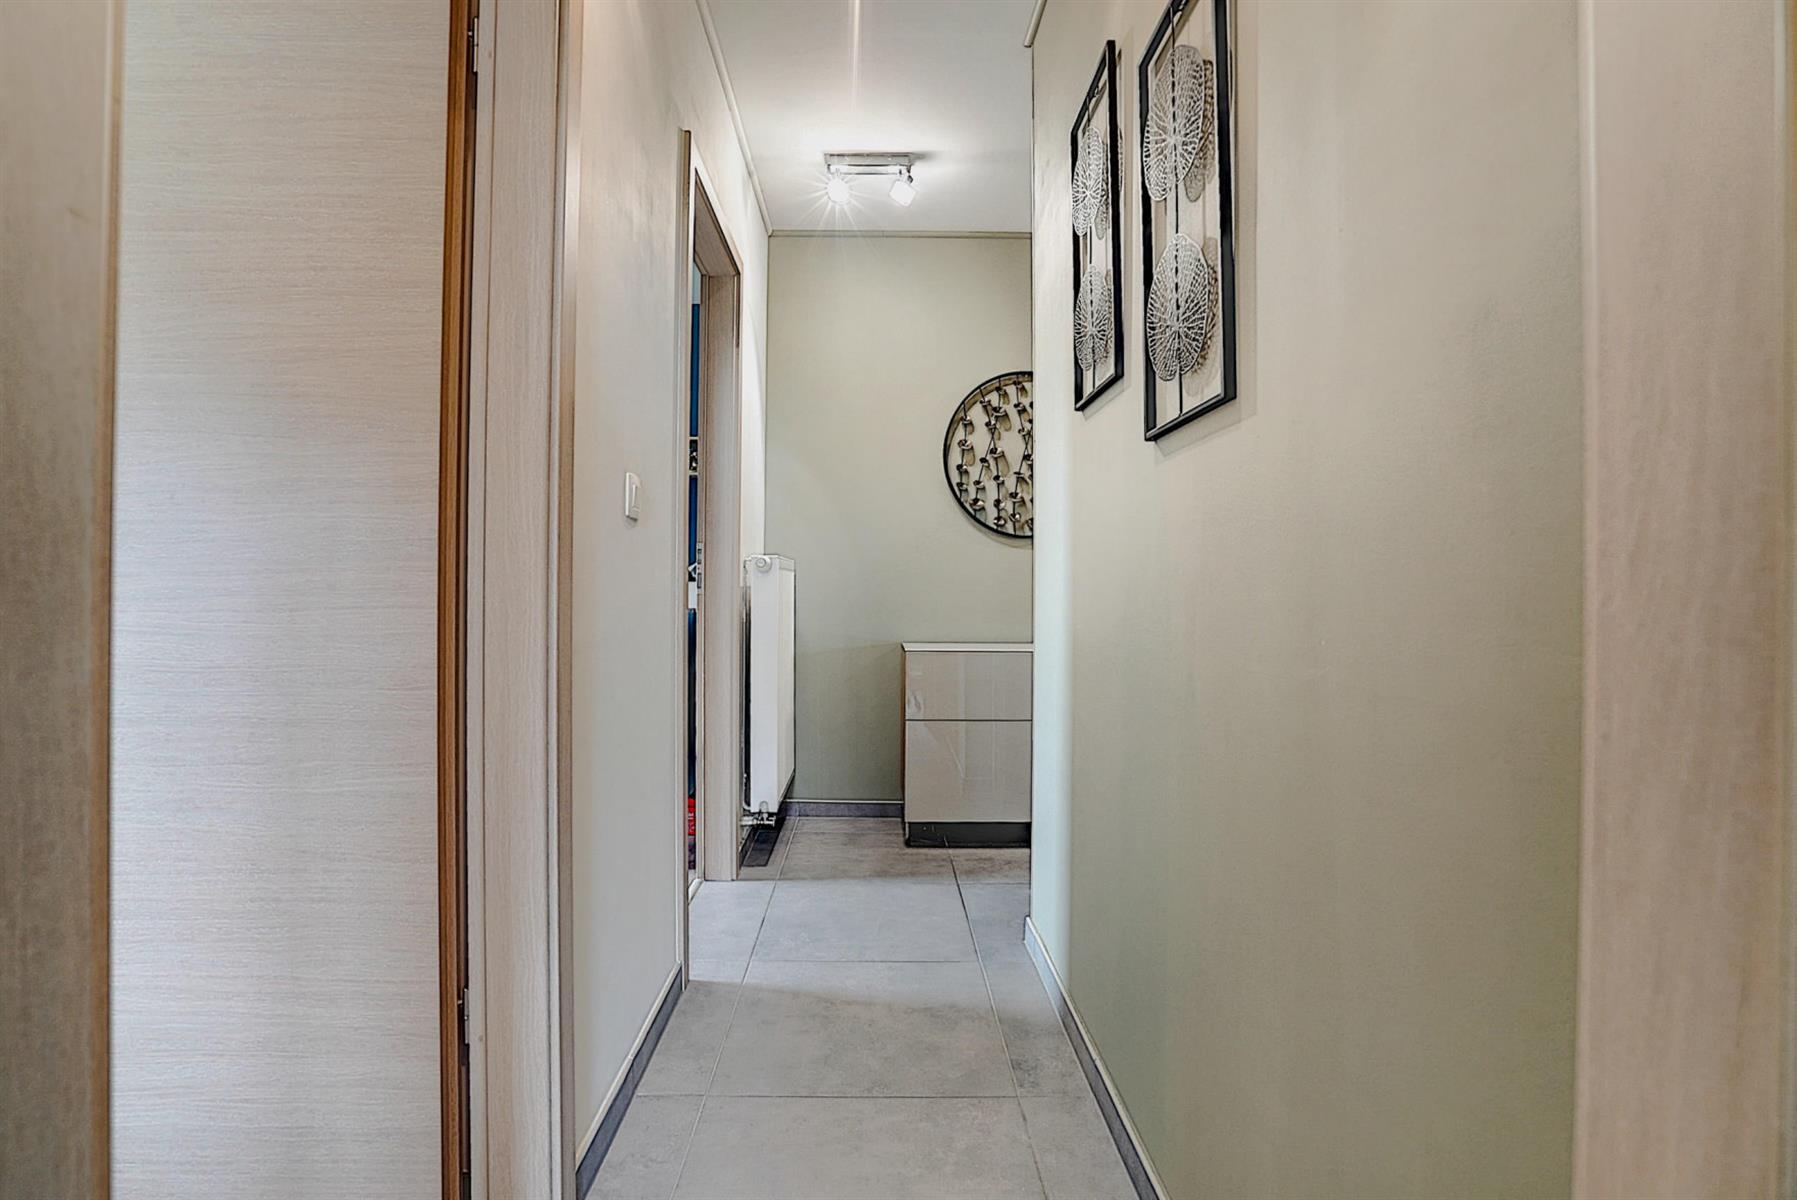 Appartement - Grâce-hollogne - #4364483-17